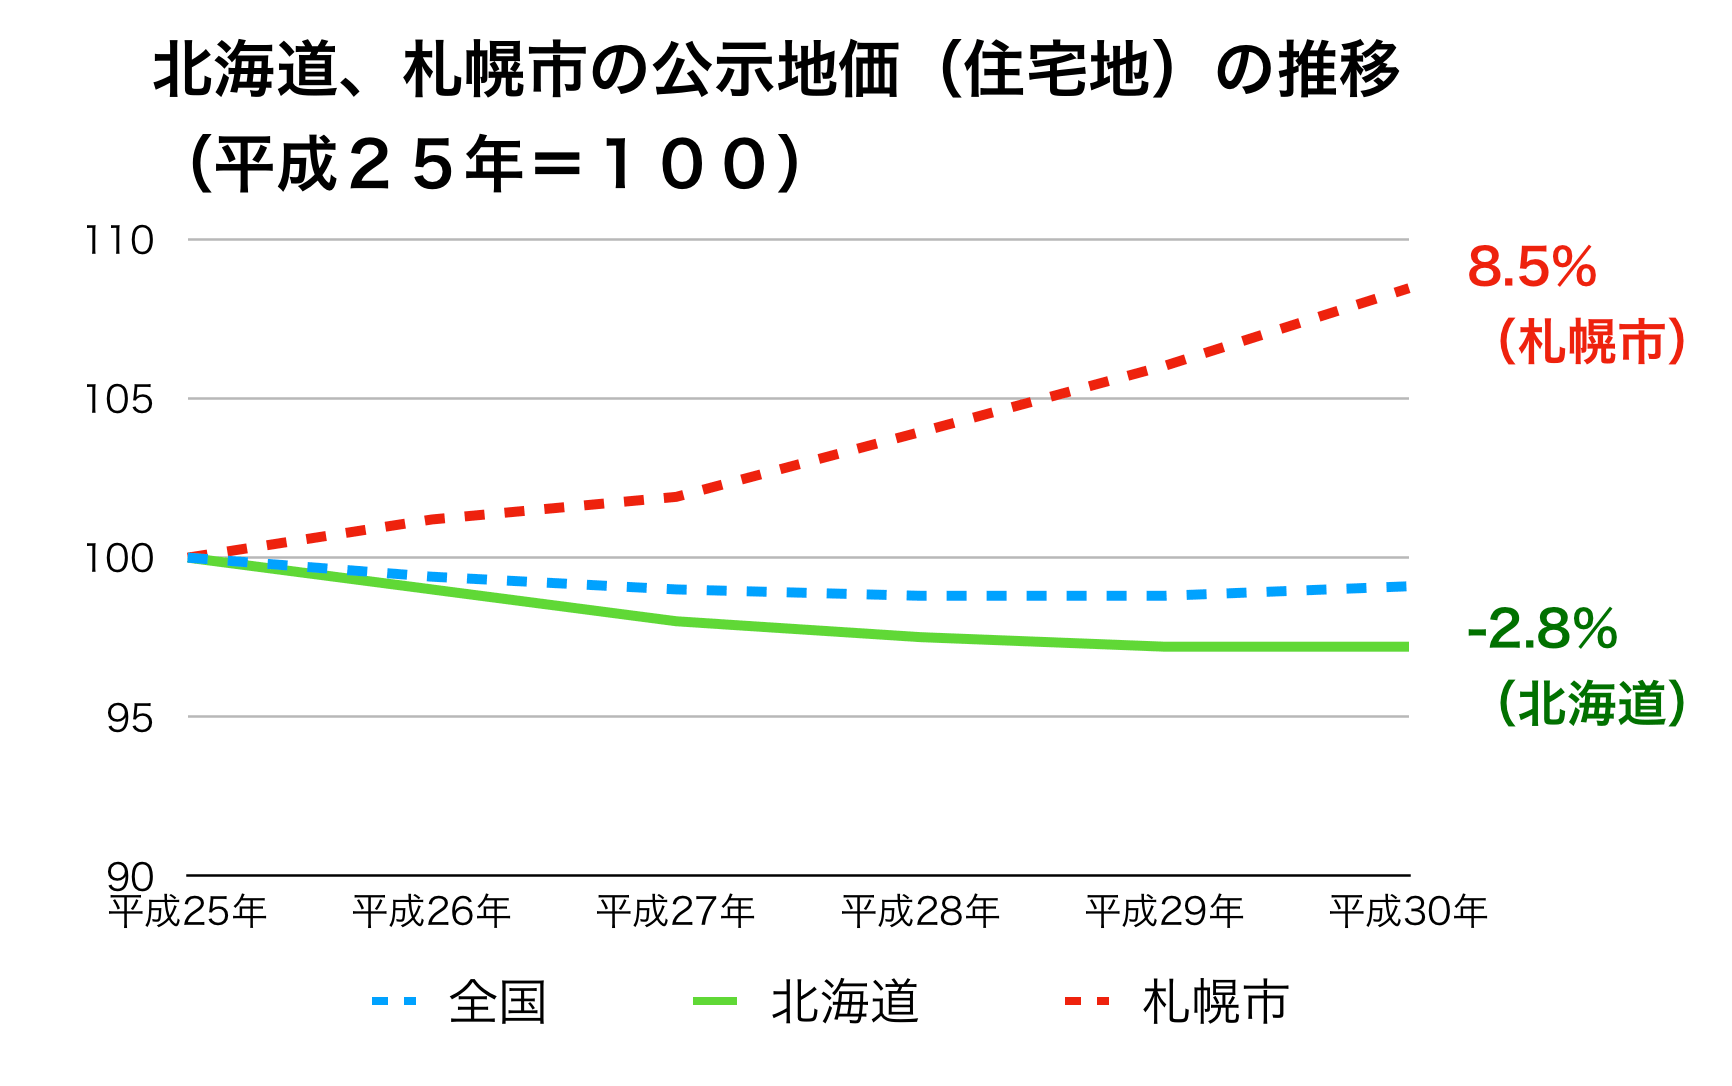 北海道の公示地価